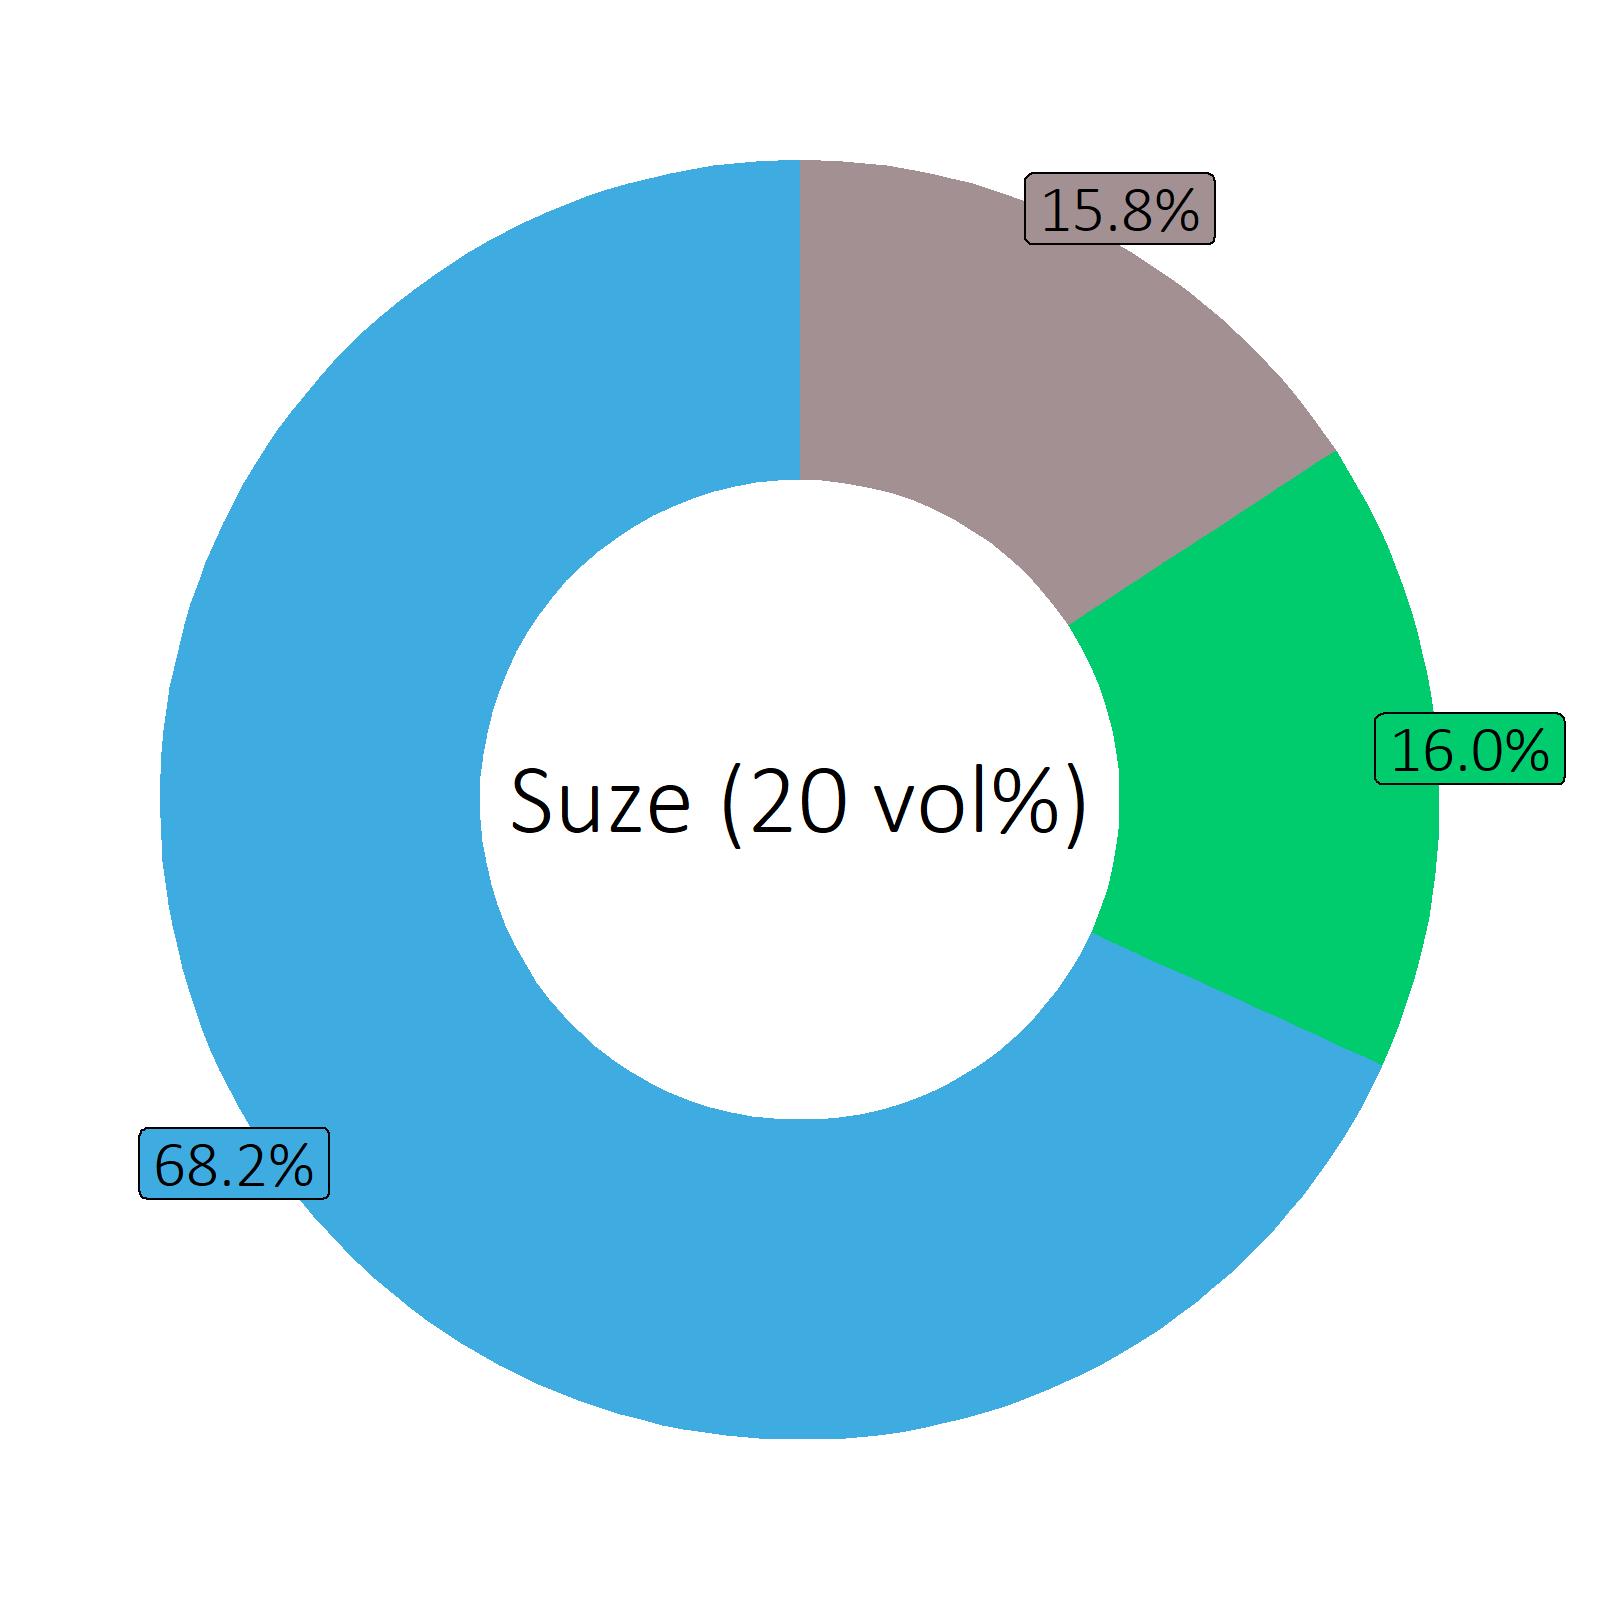 Bestandteile Suze (20 vol%)